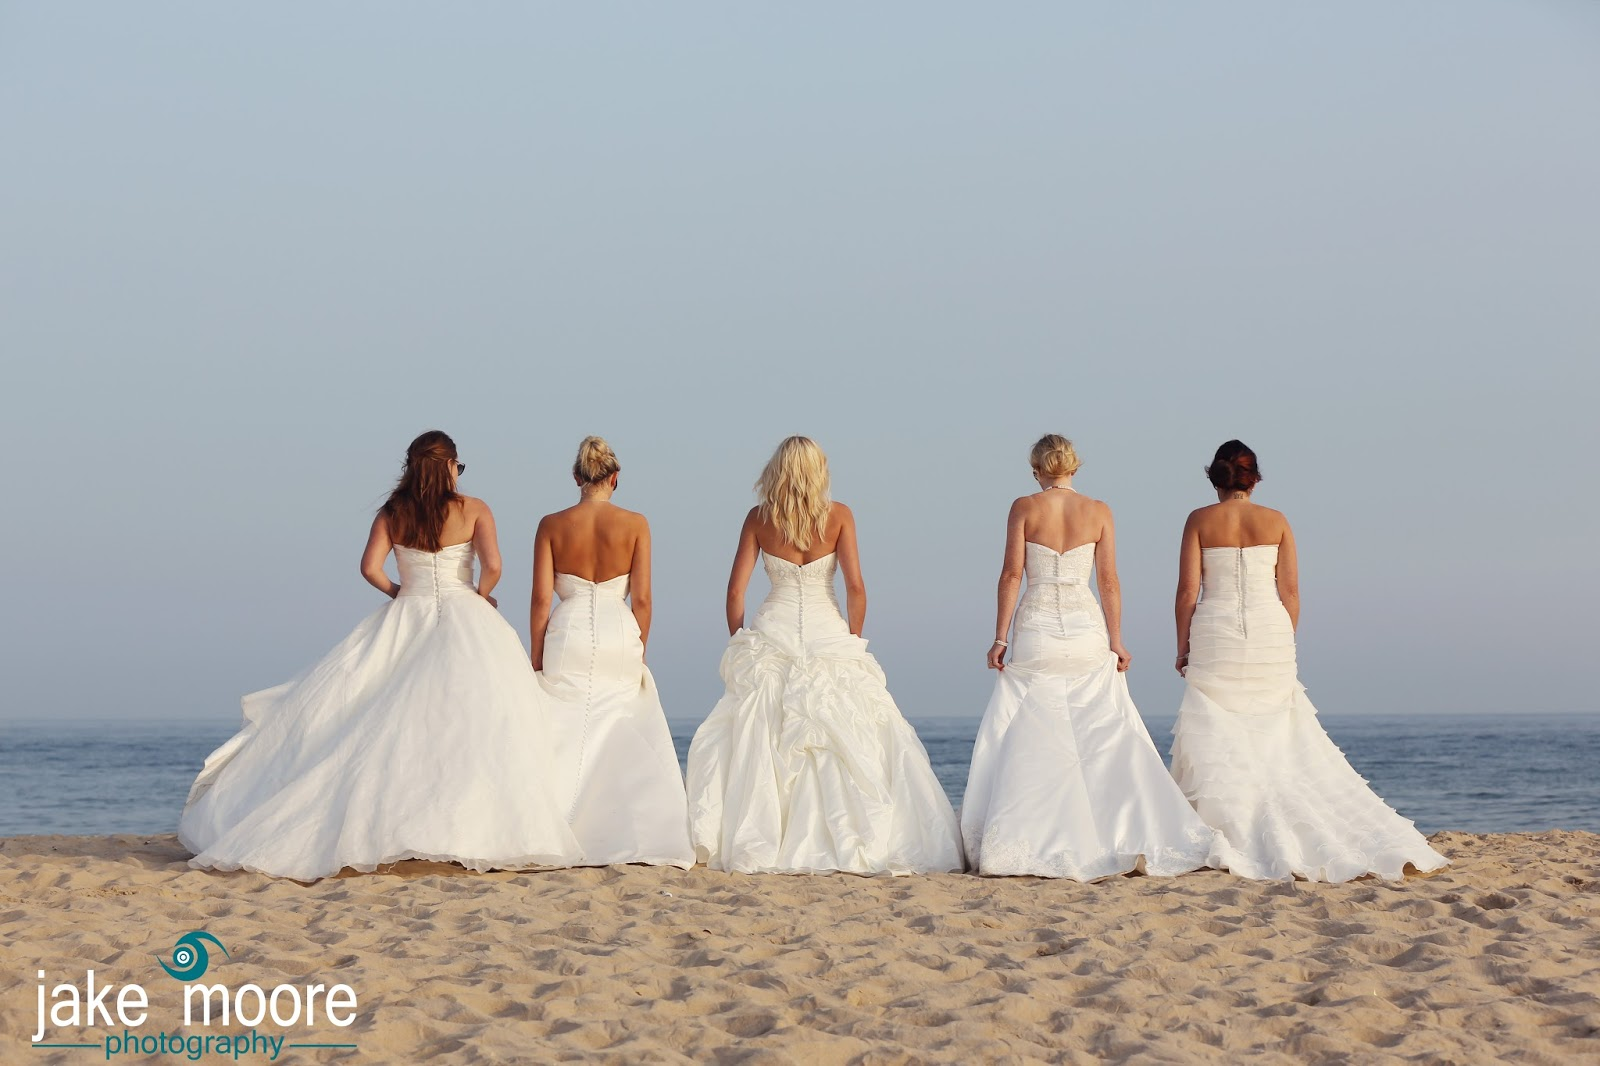 Childhood Best Friends Back In Their Wedding Dresses! - Bella Mera ...